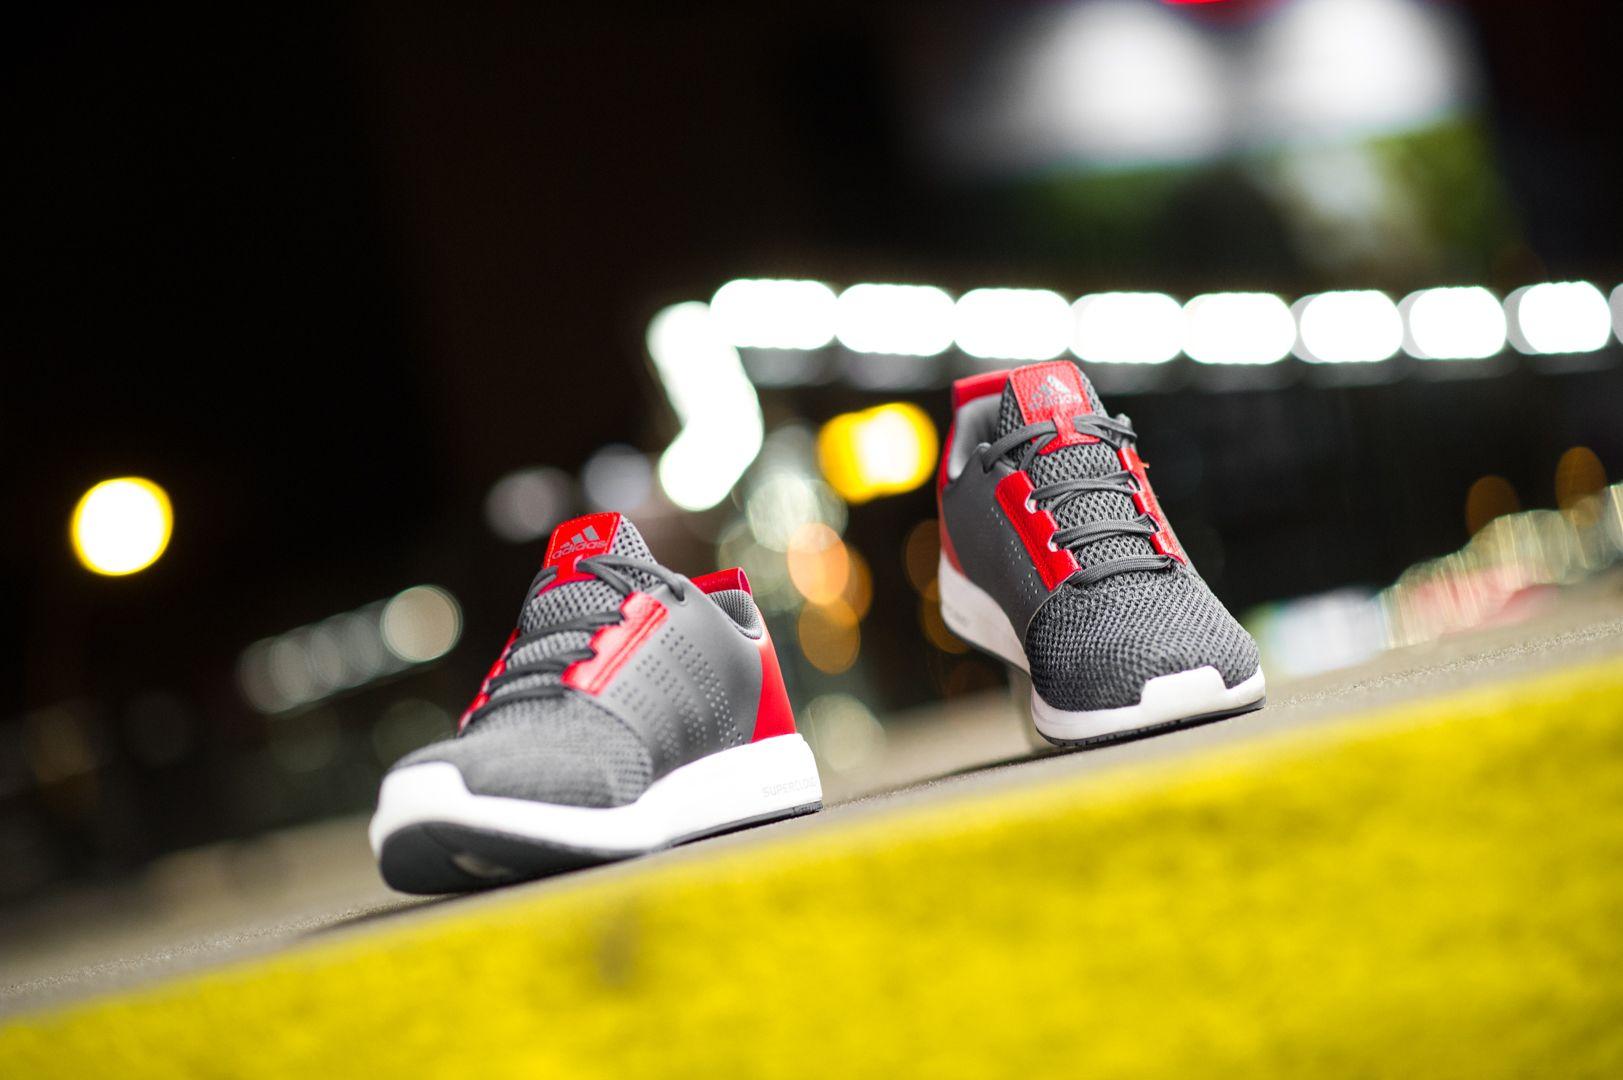 Buty Meskie Adidas Madoru 2 Af5371 Crossfit 6304558752 Oficjalne Archiwum Allegro Hummel Sneaker Shoes Sneakers